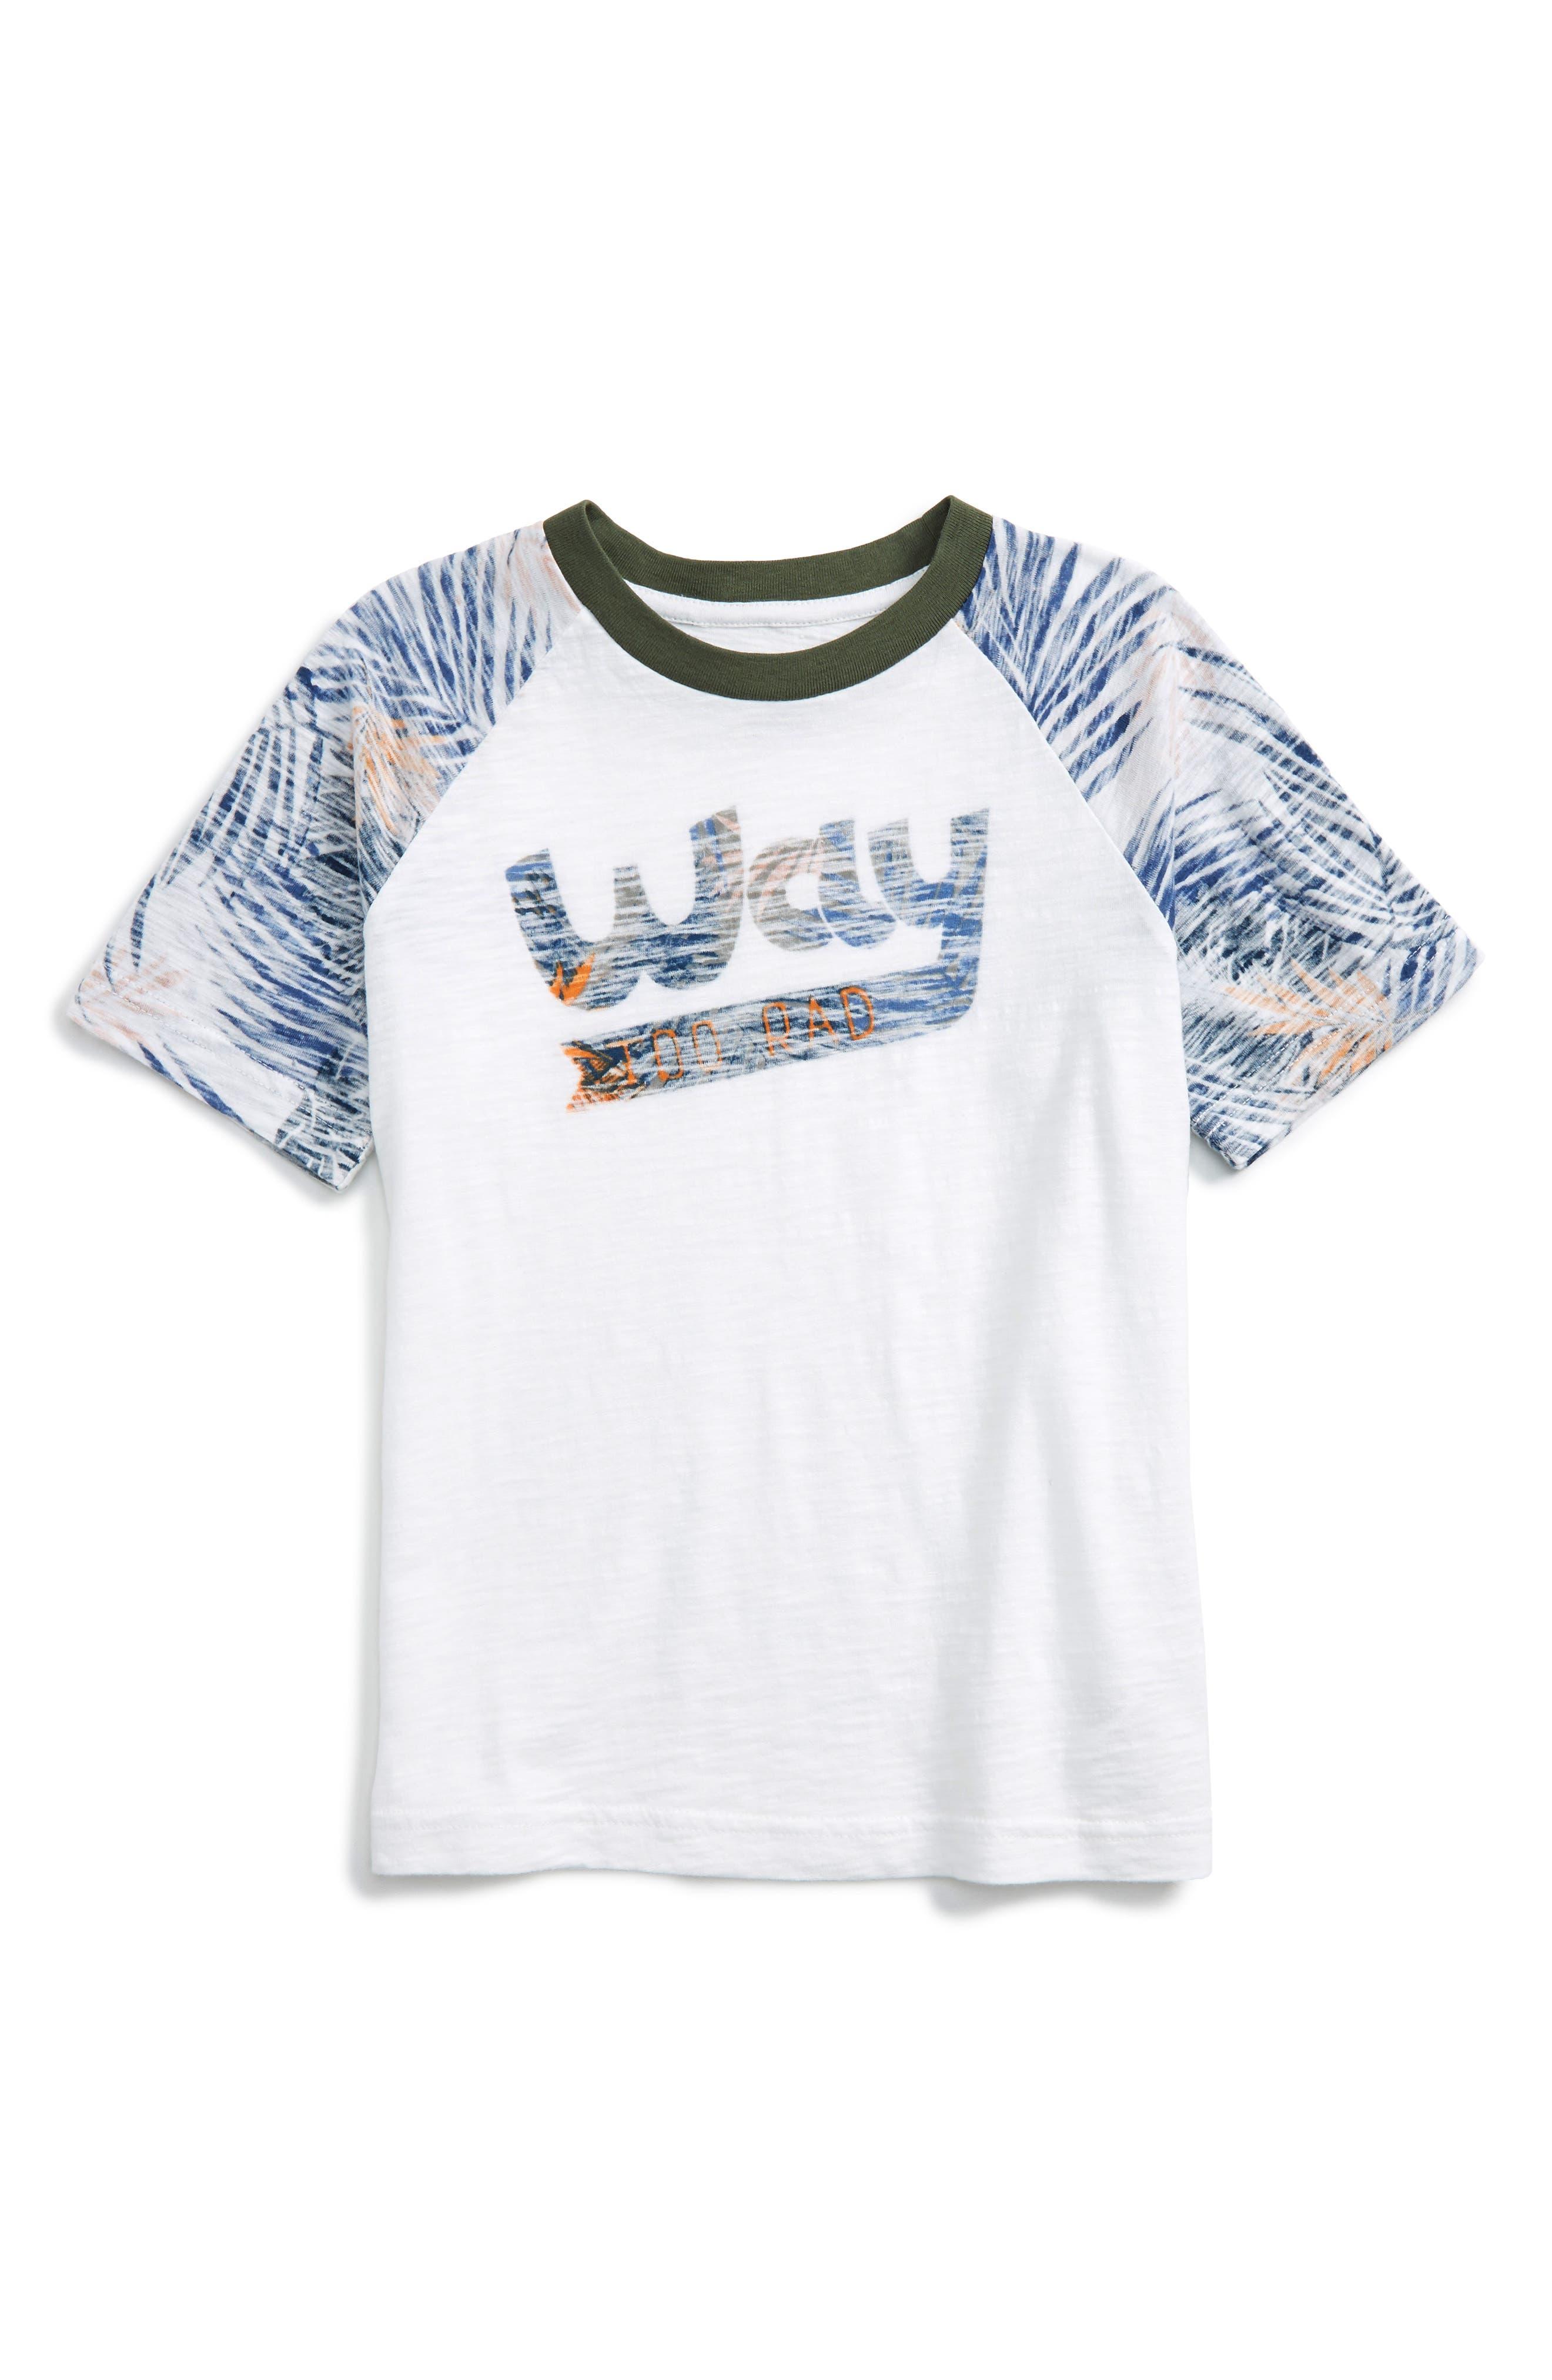 Main Image - Tucker + Tate Palm Reverse Print T-Shirt (Toddler Boys & Little Boys)